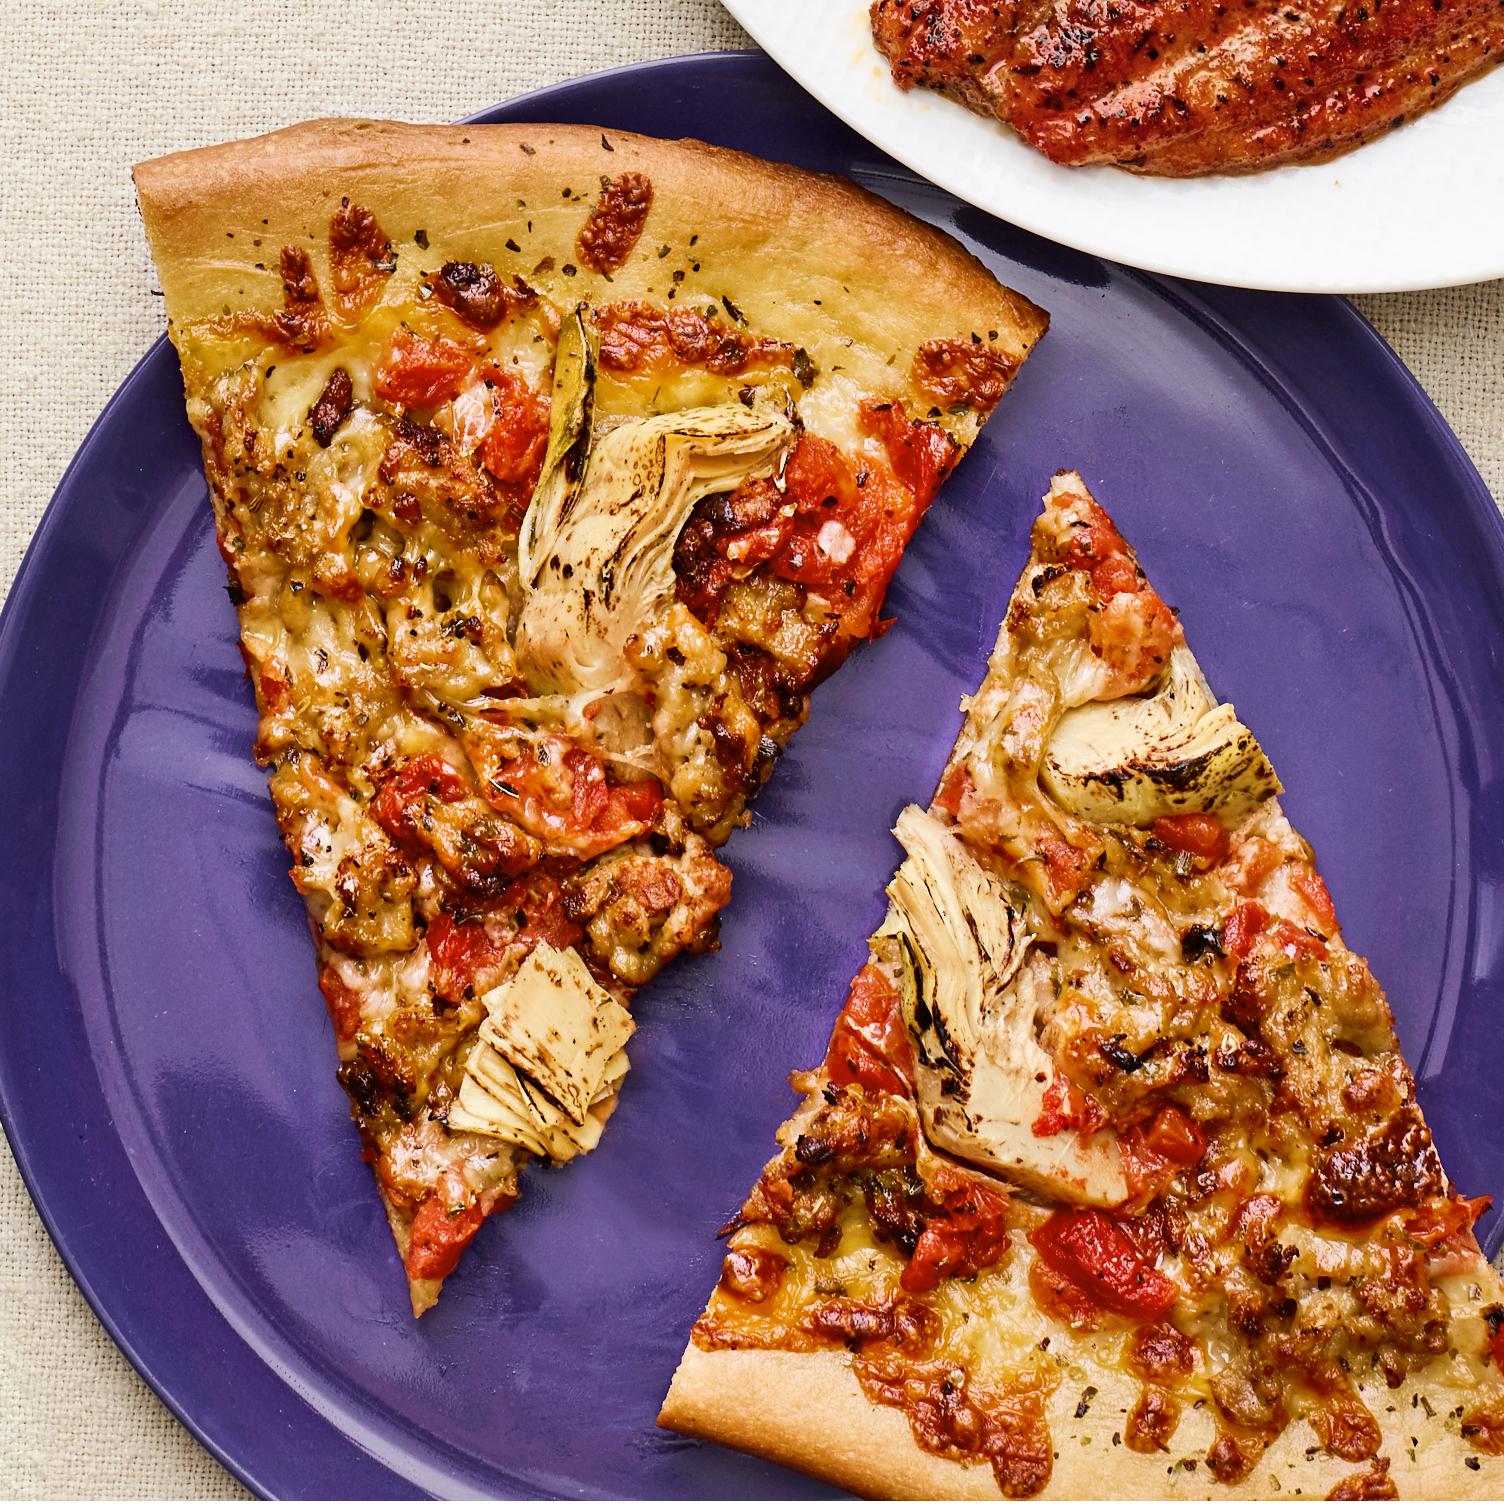 artichoke & sausage pizza